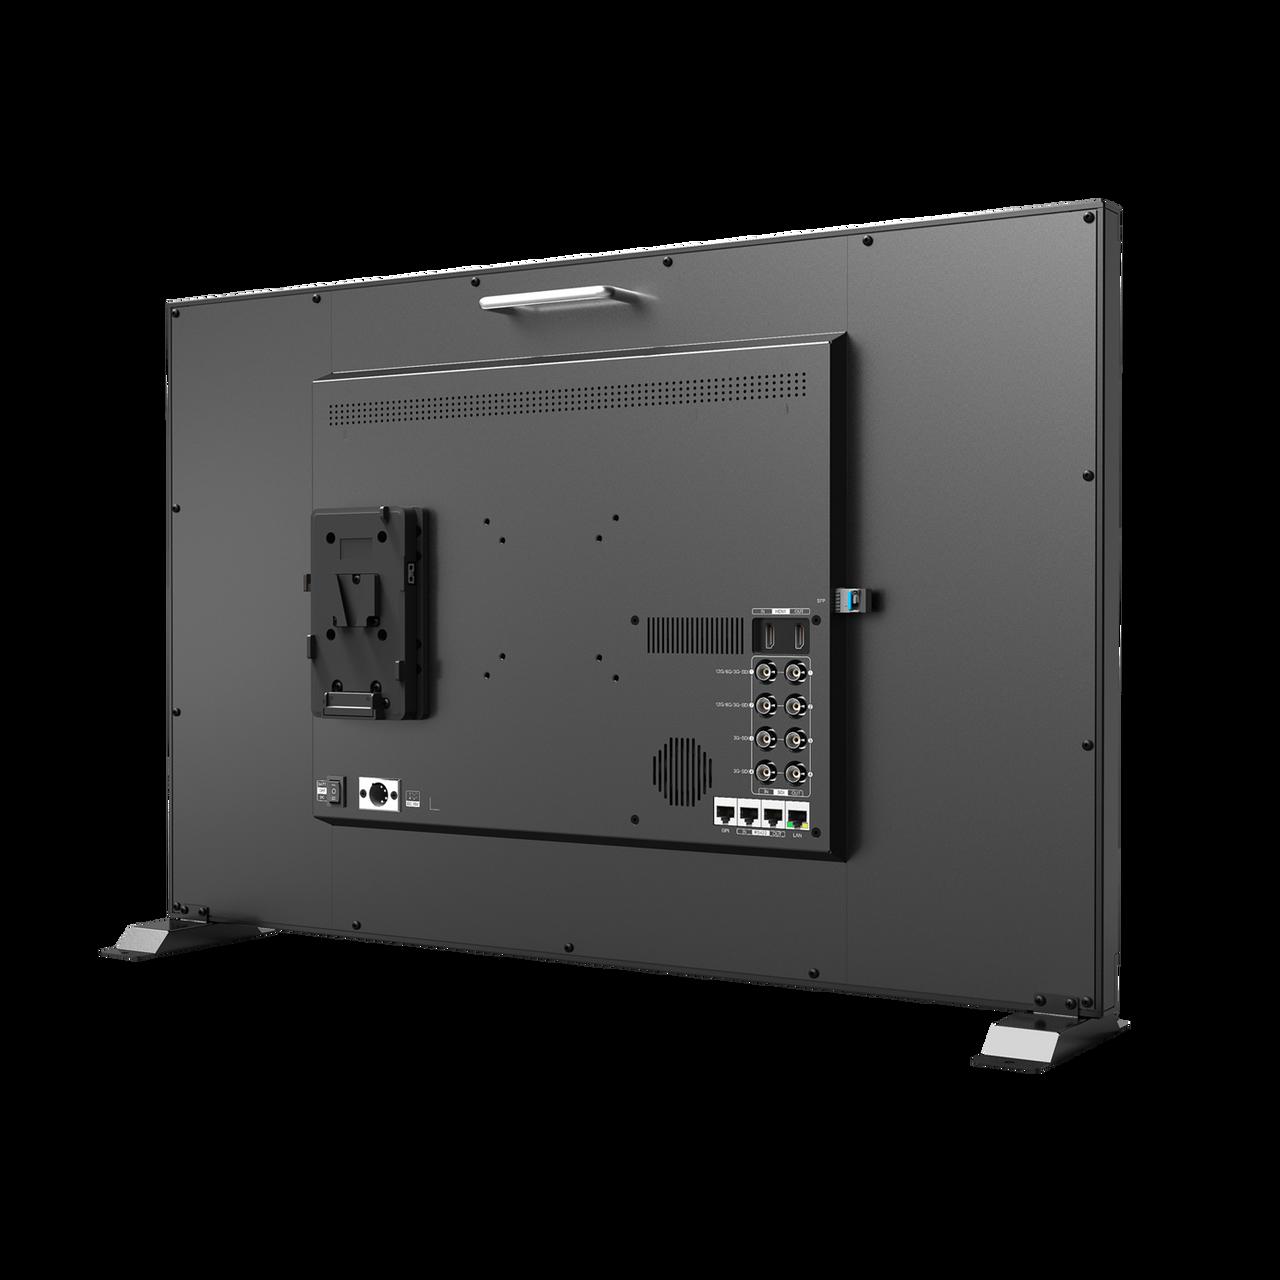 Q31 31.5 inch 12G-SDI professional broadcast production studio monitor